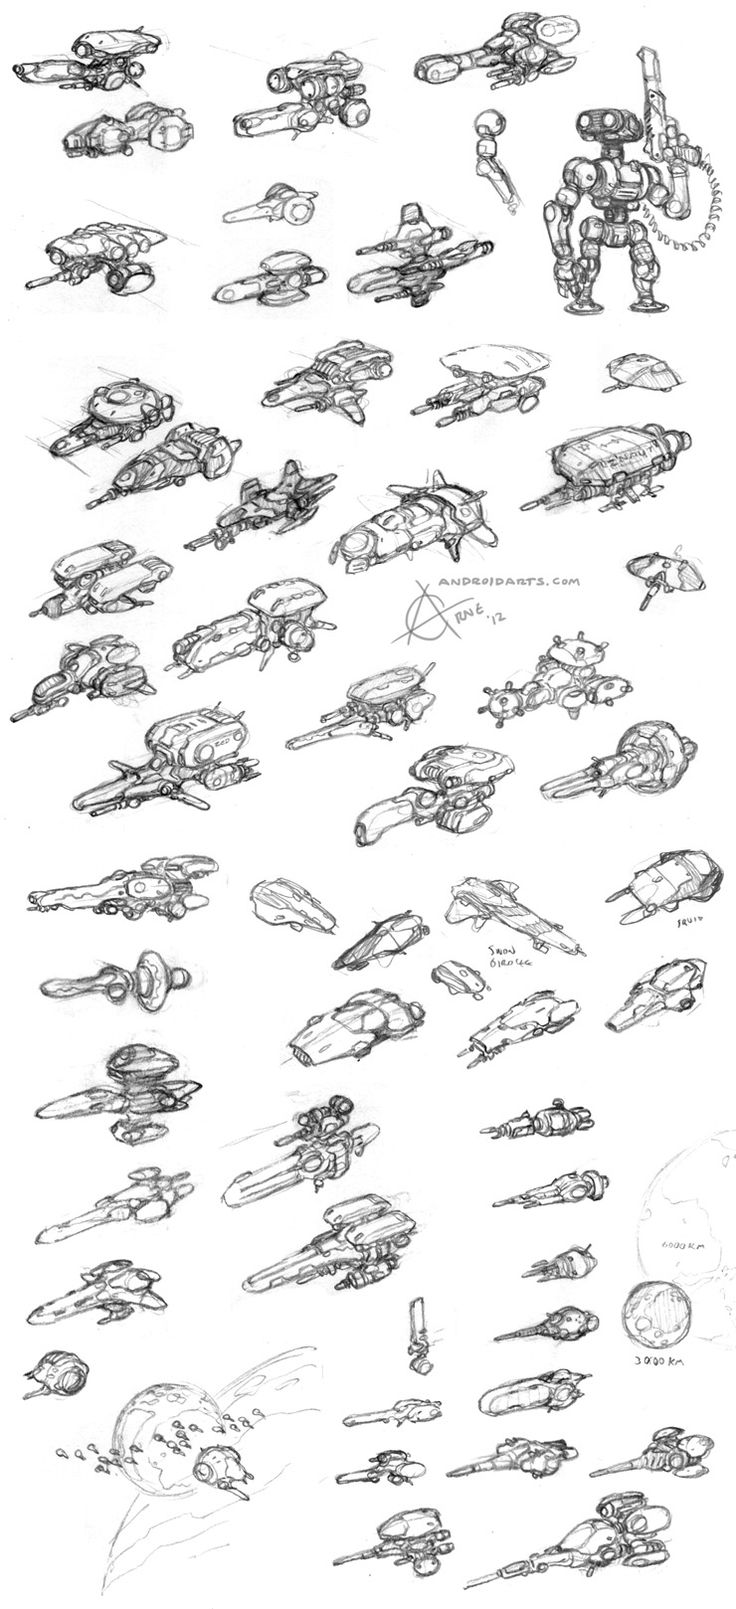 Spaceship design - Spaceship Concepts - Vehicle Design